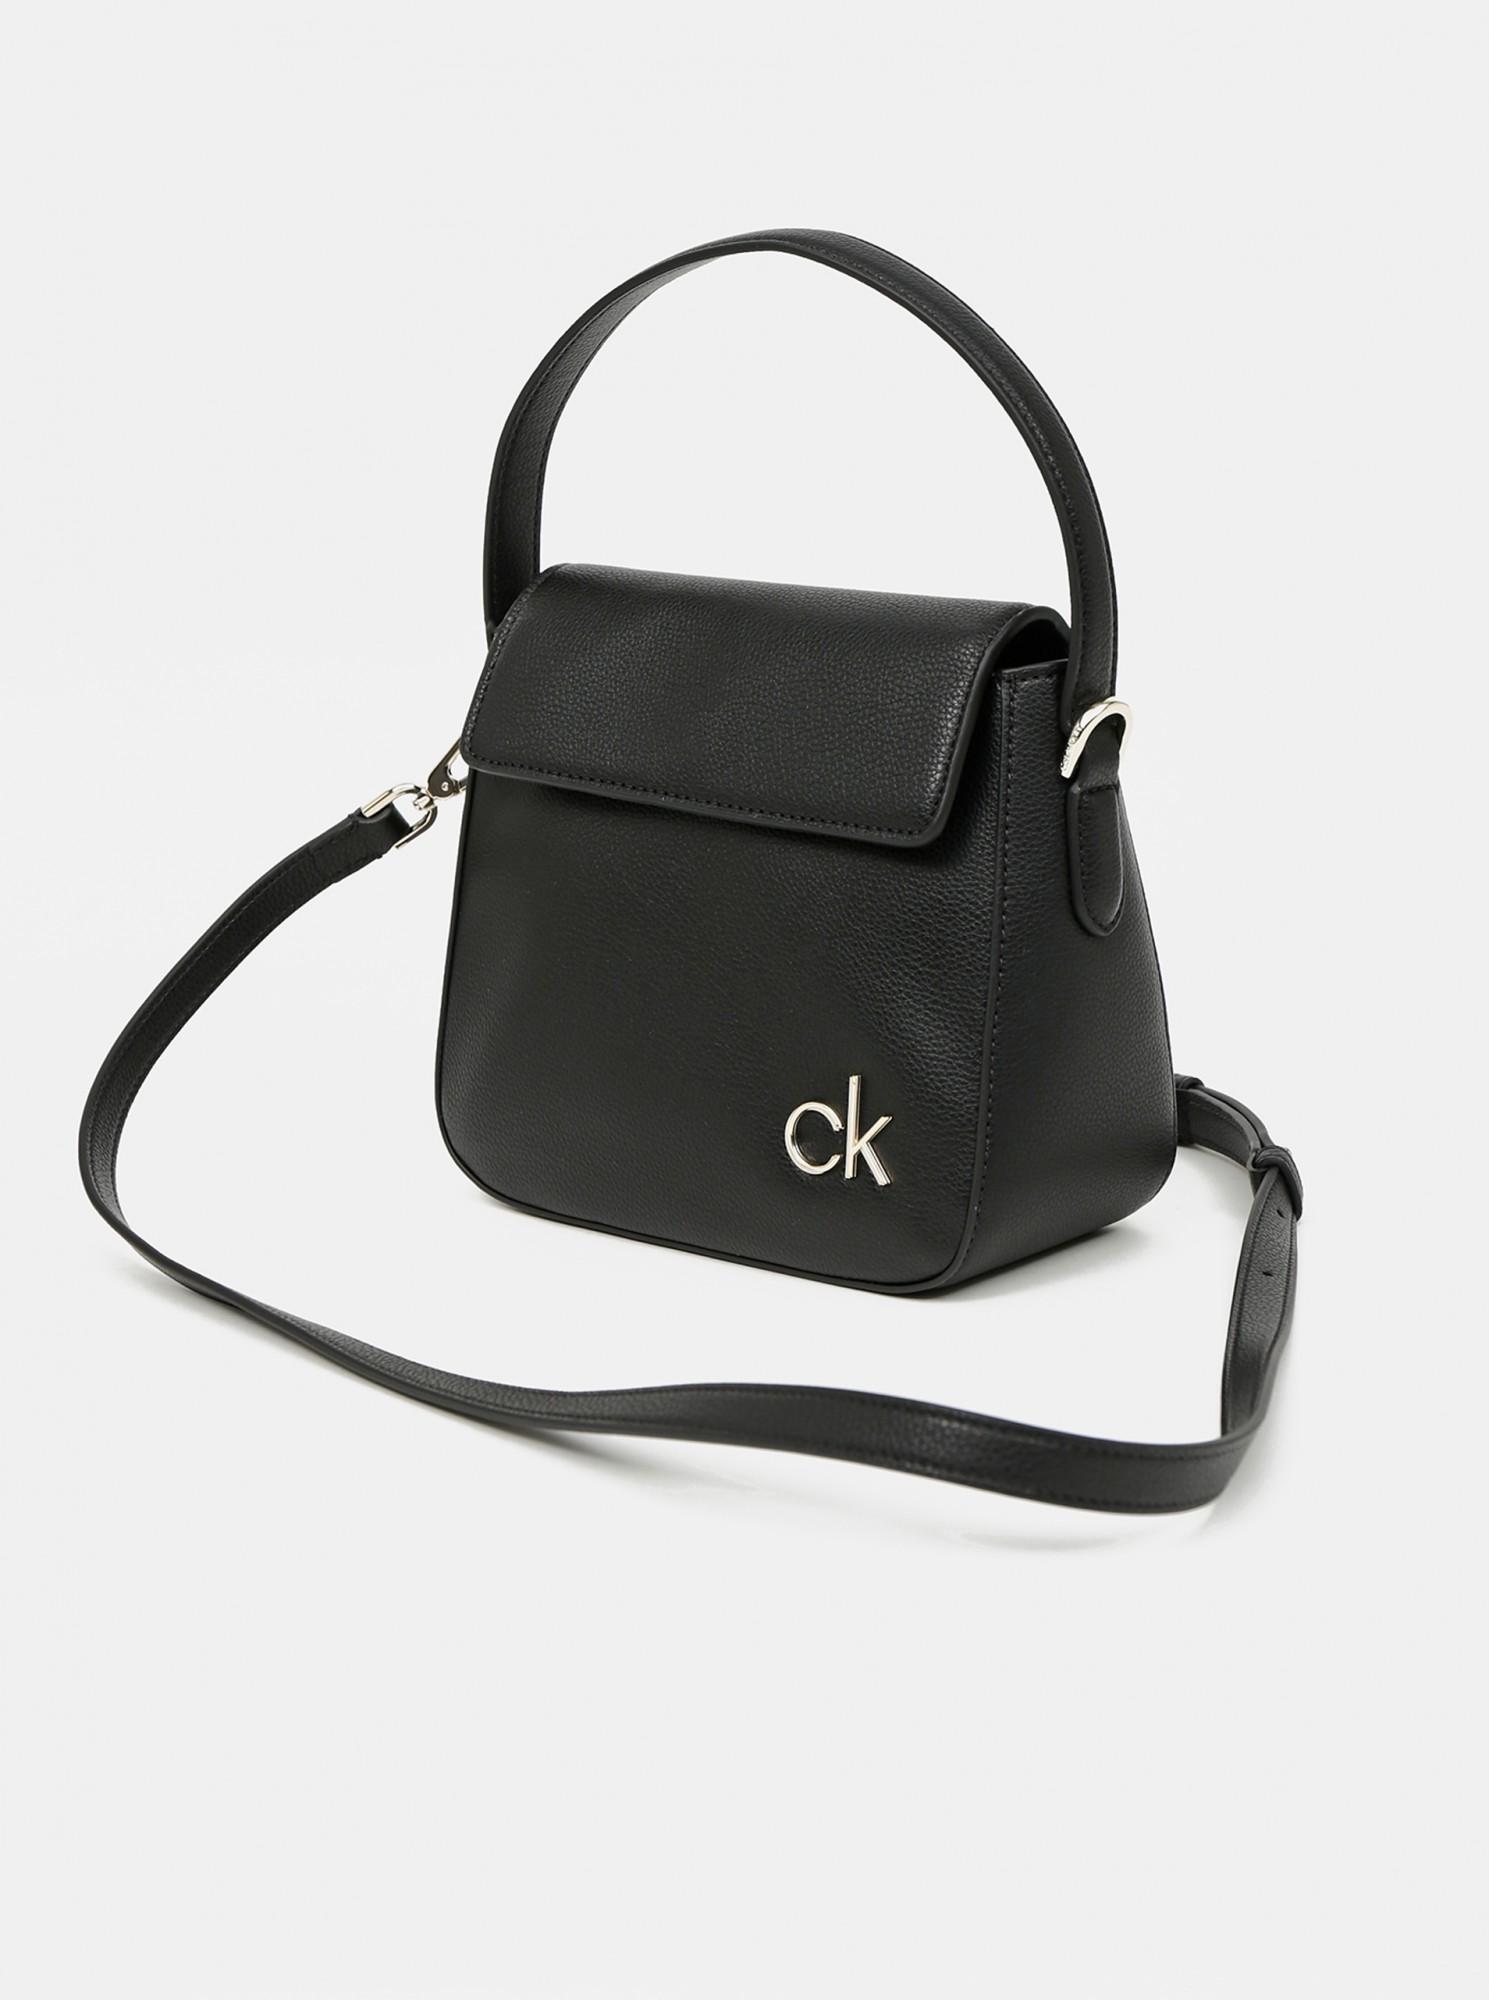 Calvin Klein fekete kézitáska Hobo W/Flap